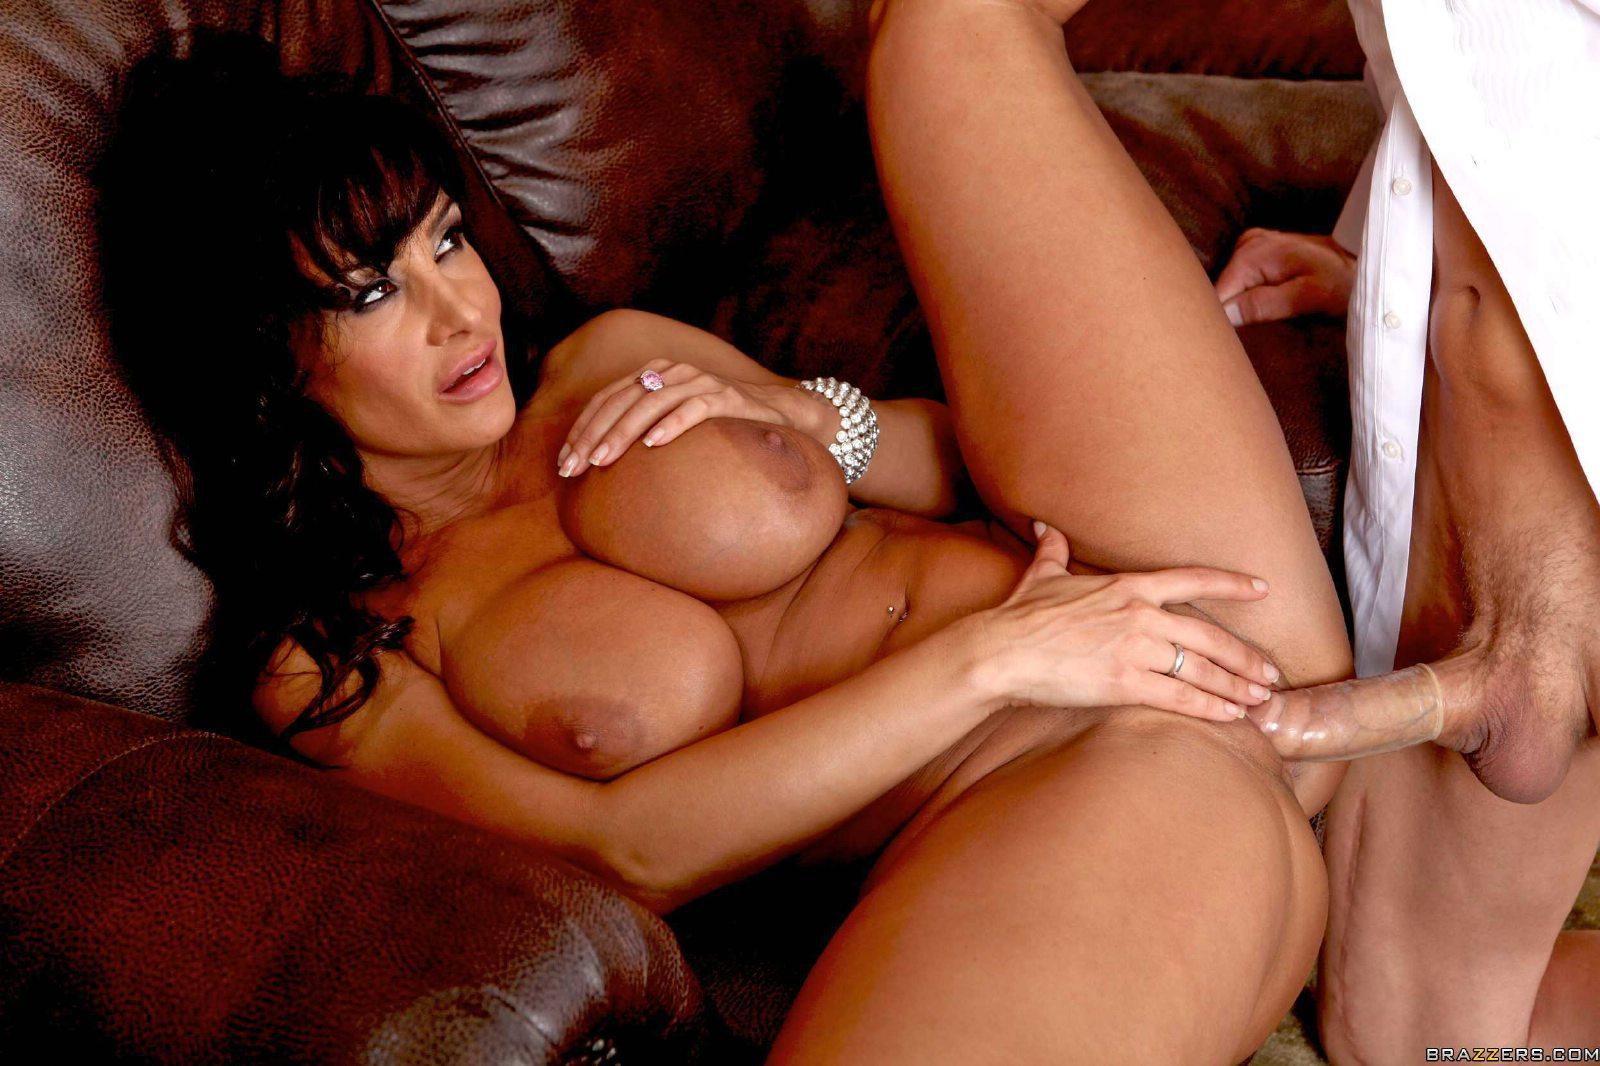 Lisa ann free mobile porn